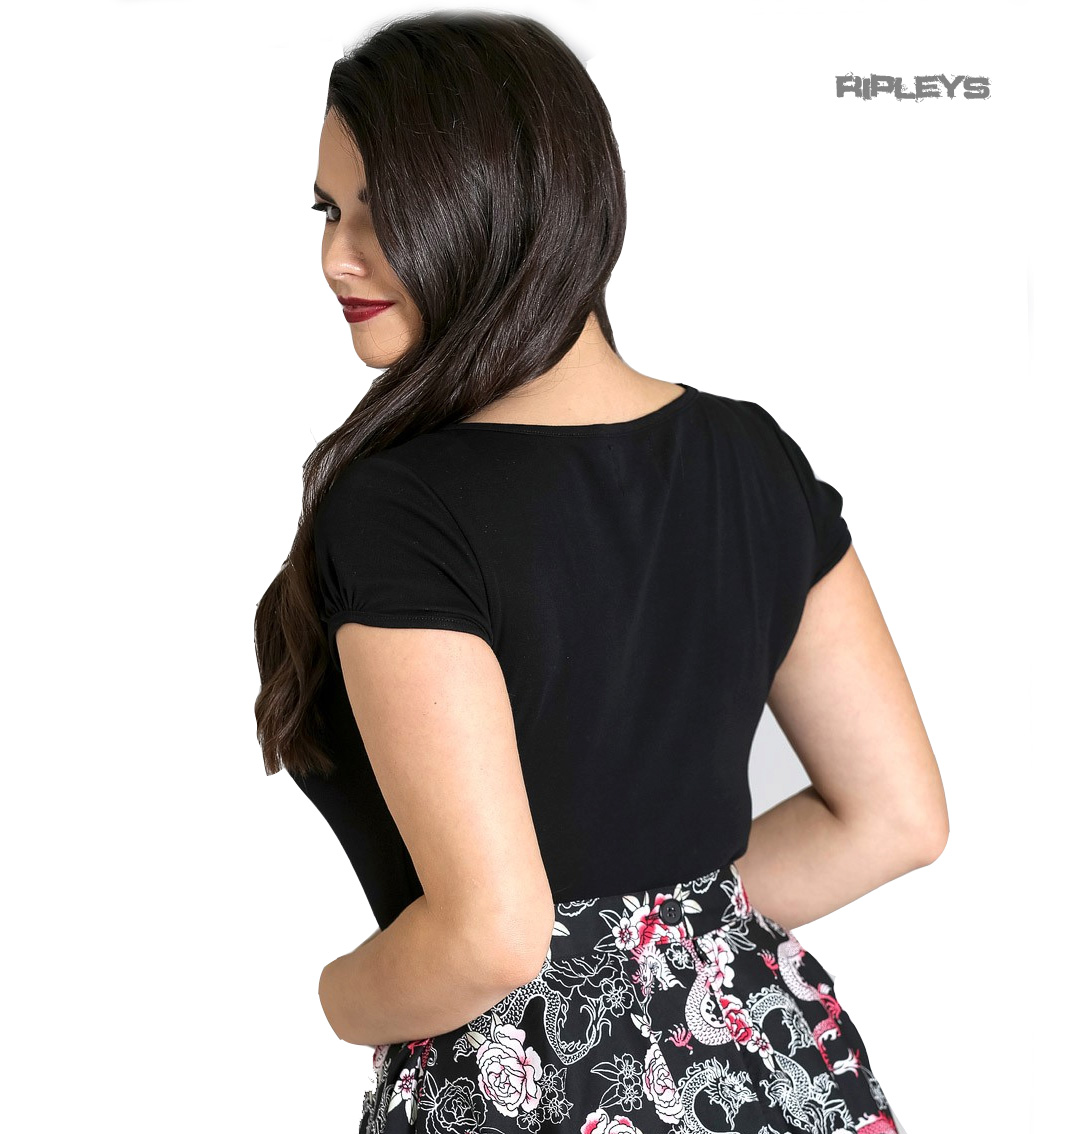 Hell-Bunny-Shirt-50s-Rockabilly-Top-MIA-Plain-Black-Short-Sleeves-All-Sizes thumbnail 28